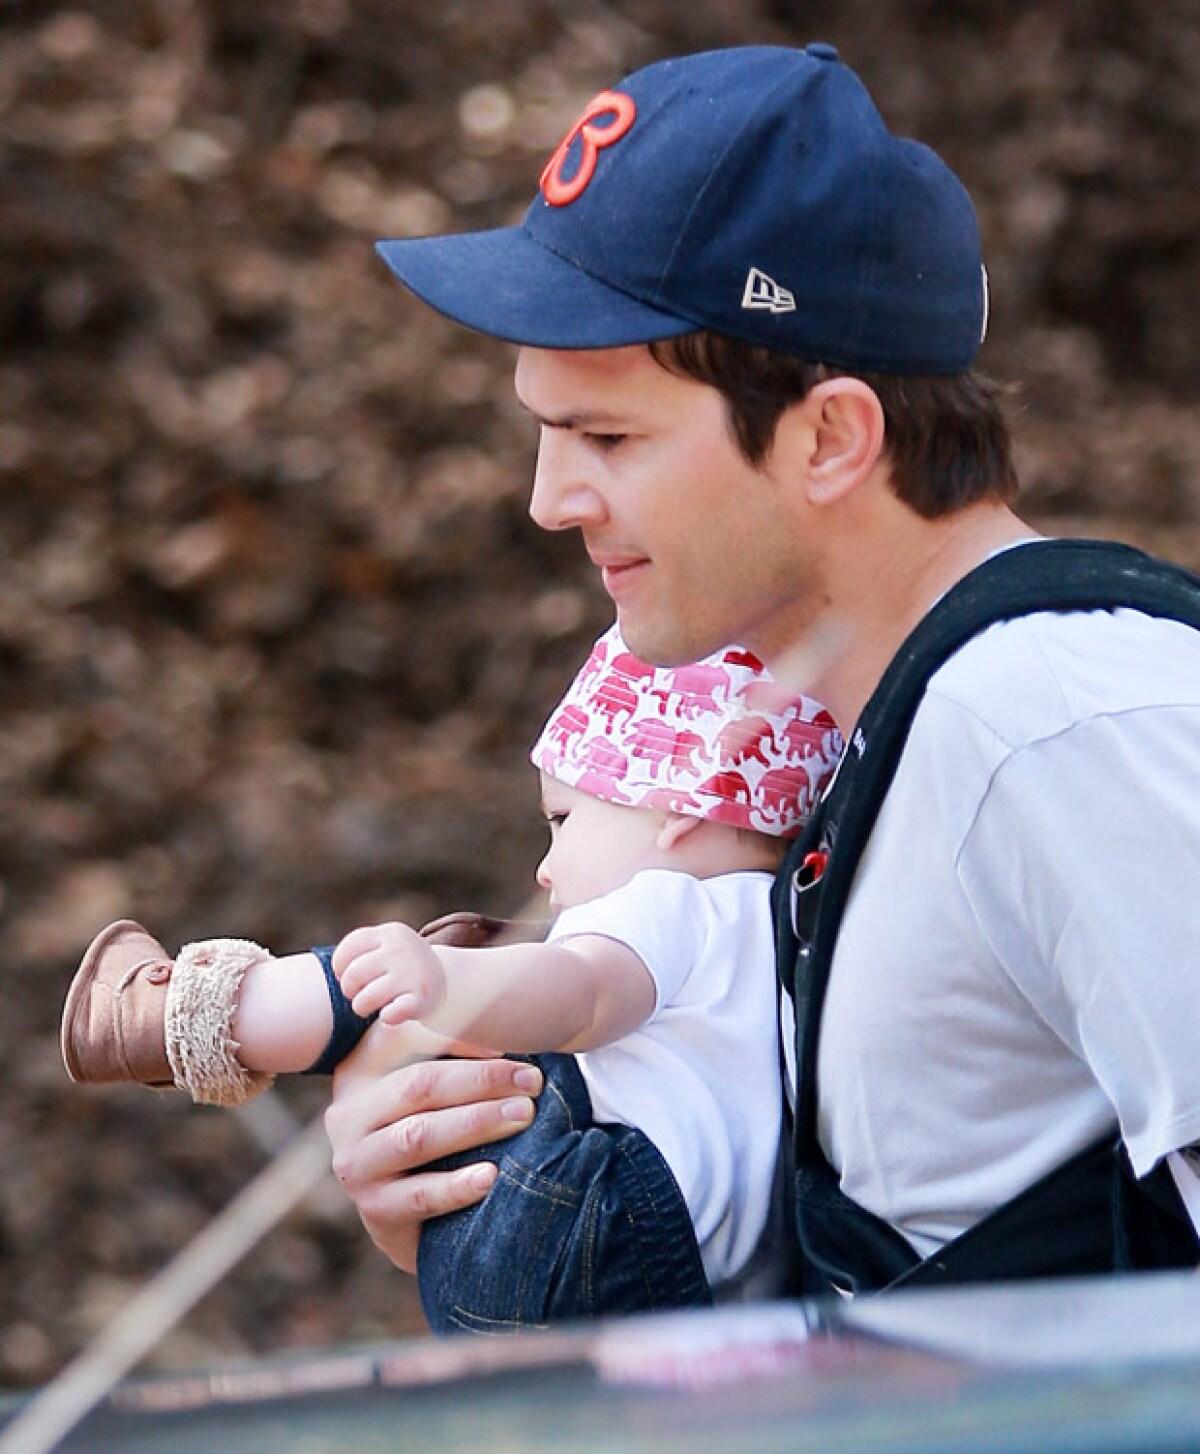 FOTOS: Ashton Kutcher deja ver a su hija Wyatt Isabelle en paseo